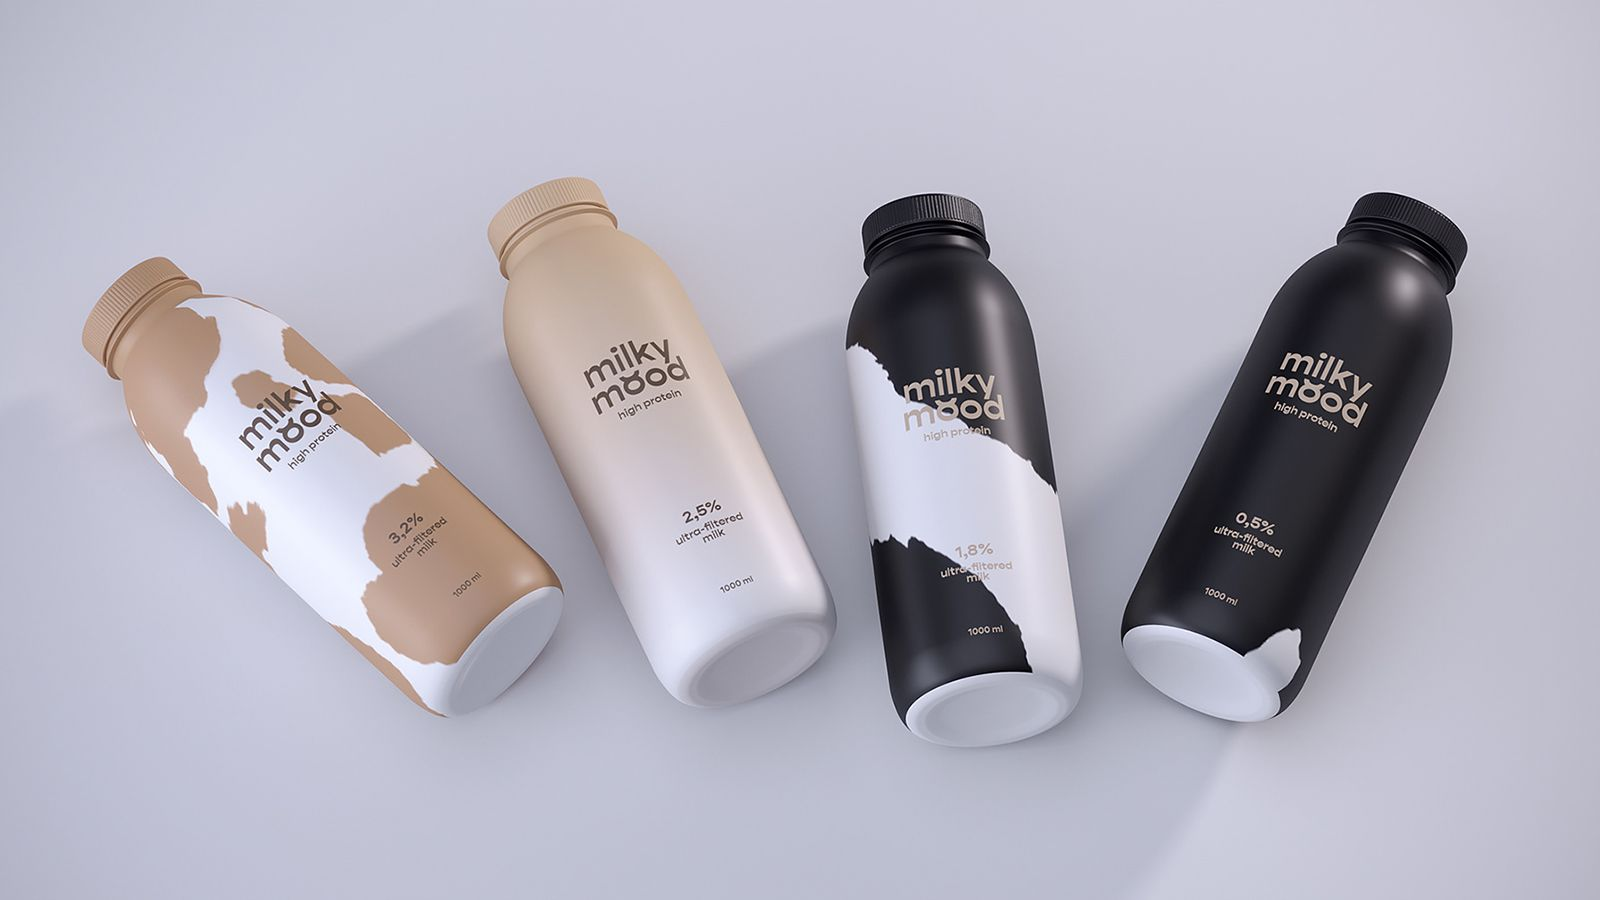 Milky Mood (lait) I Design (projet étudiant) : Lilit, Russie (mars 2020)